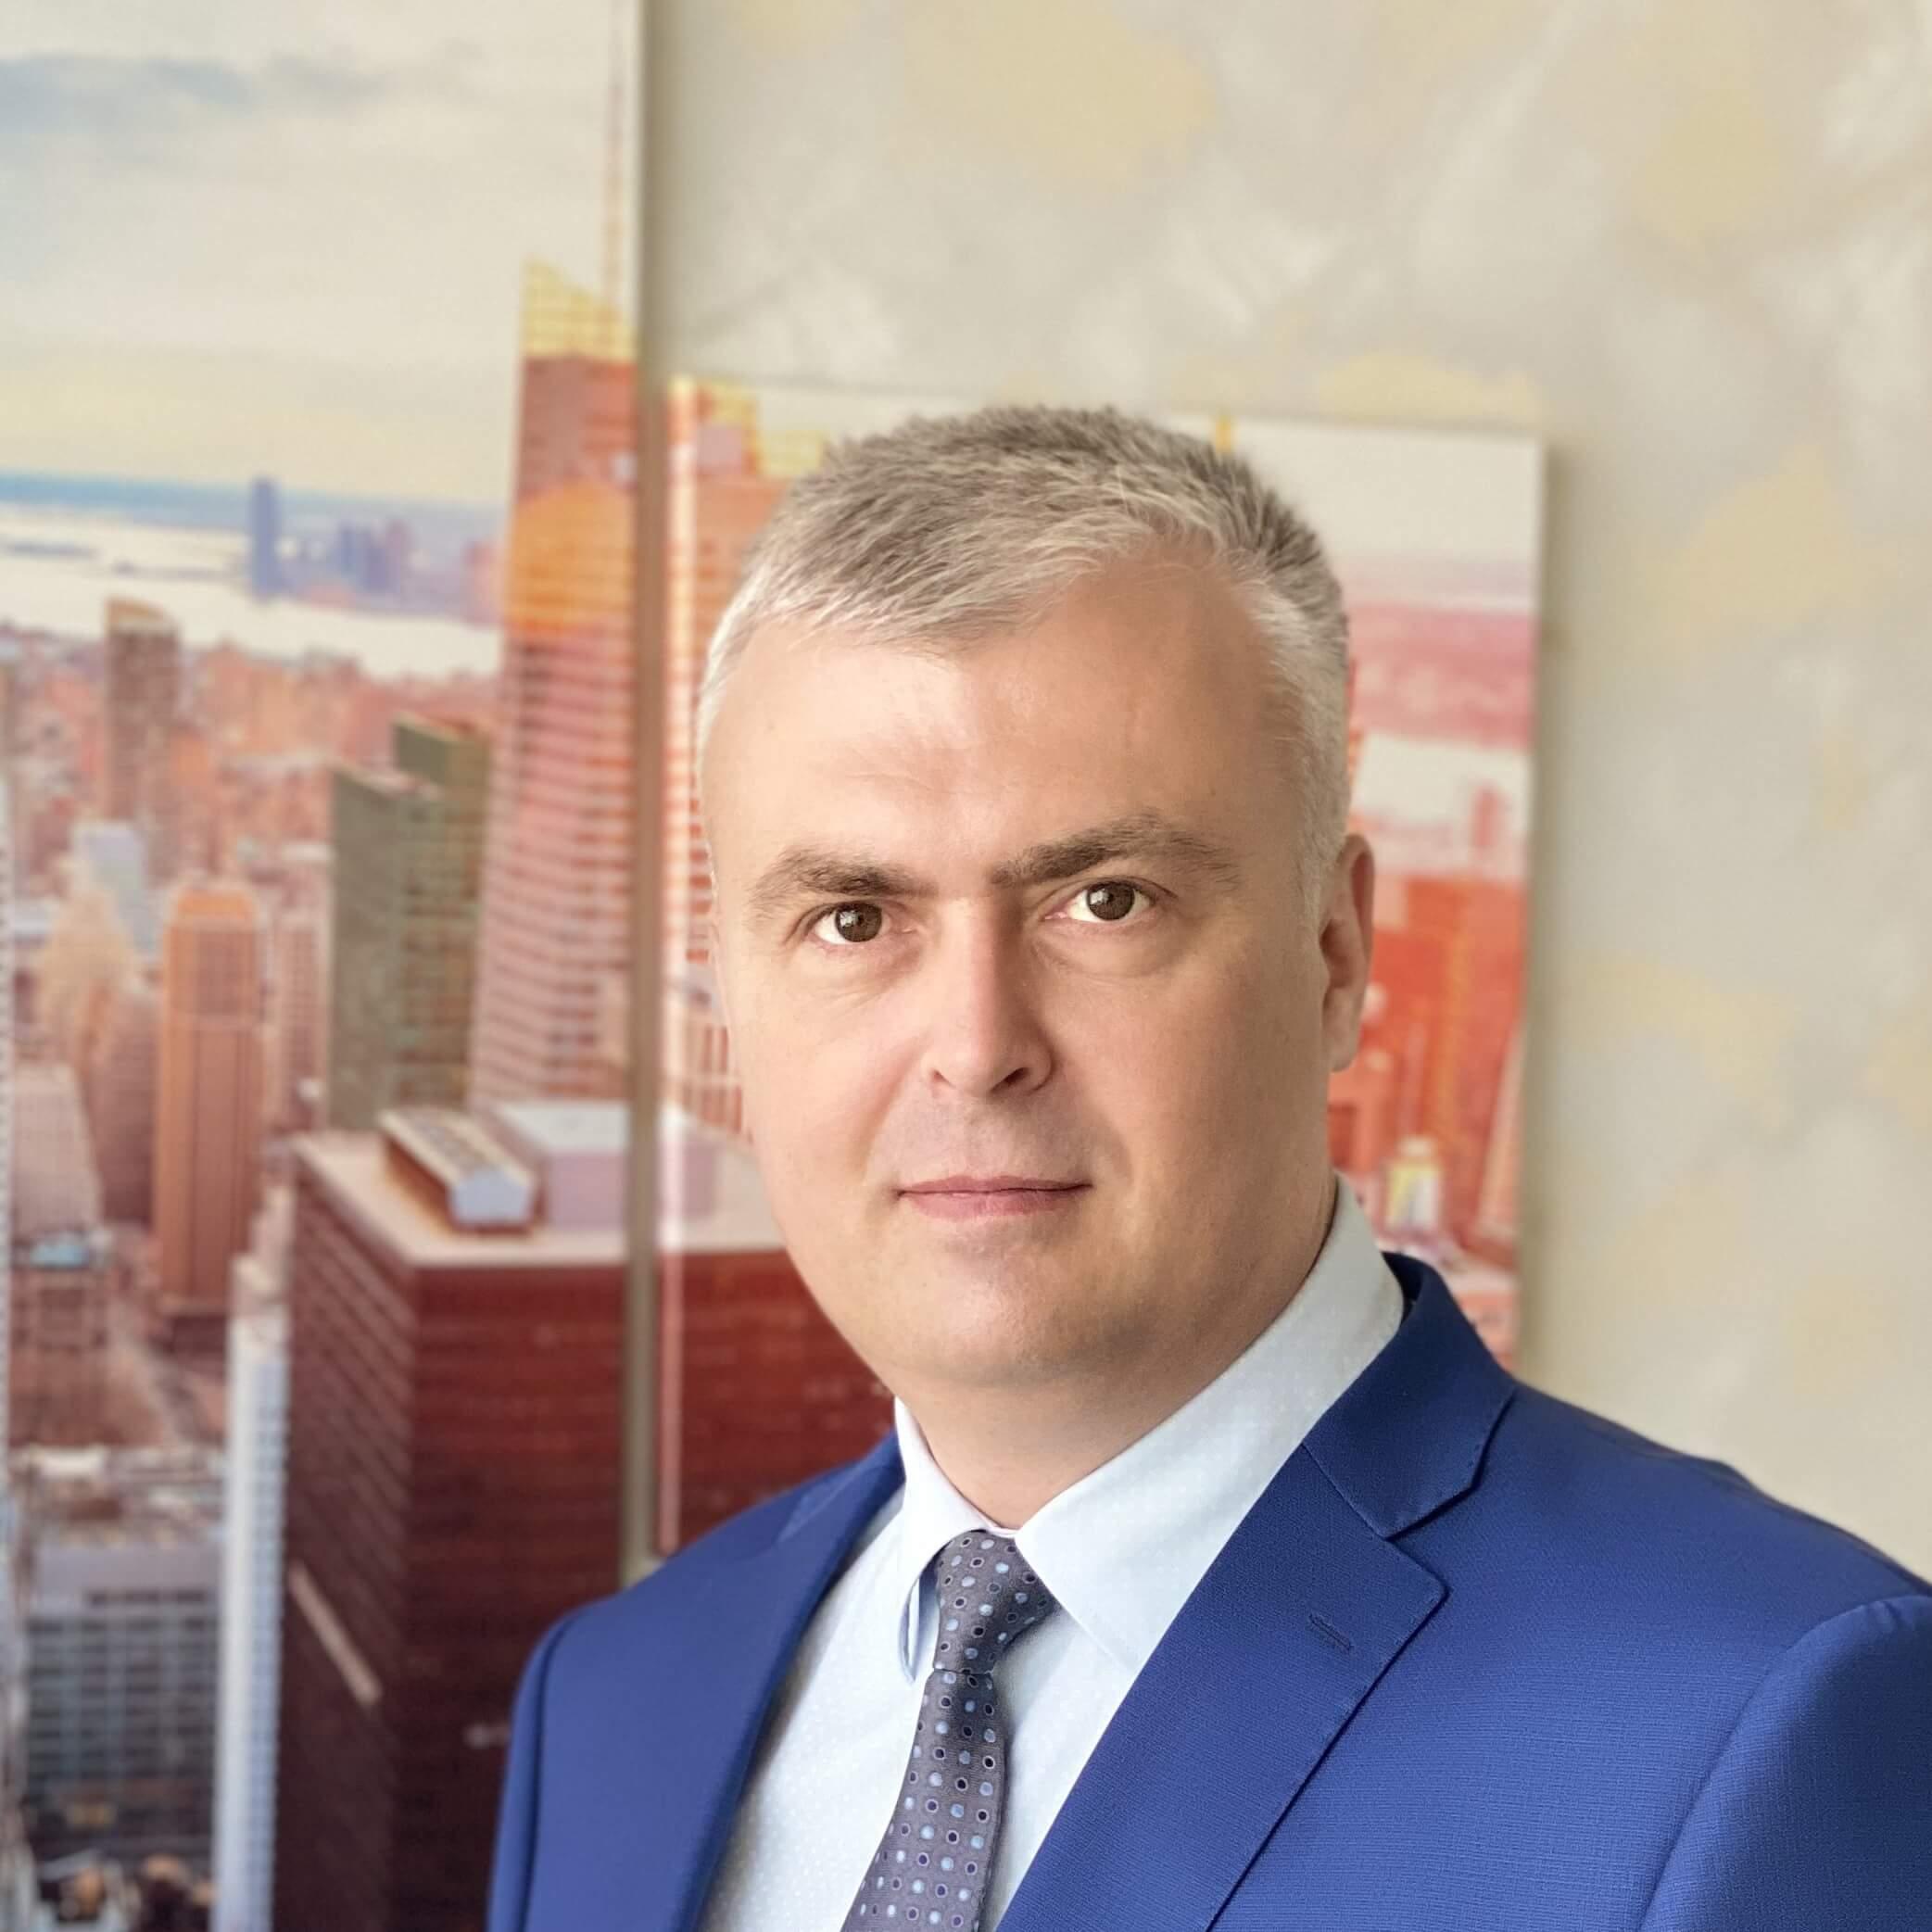 Адвокат Балдин Дмитрий Москва